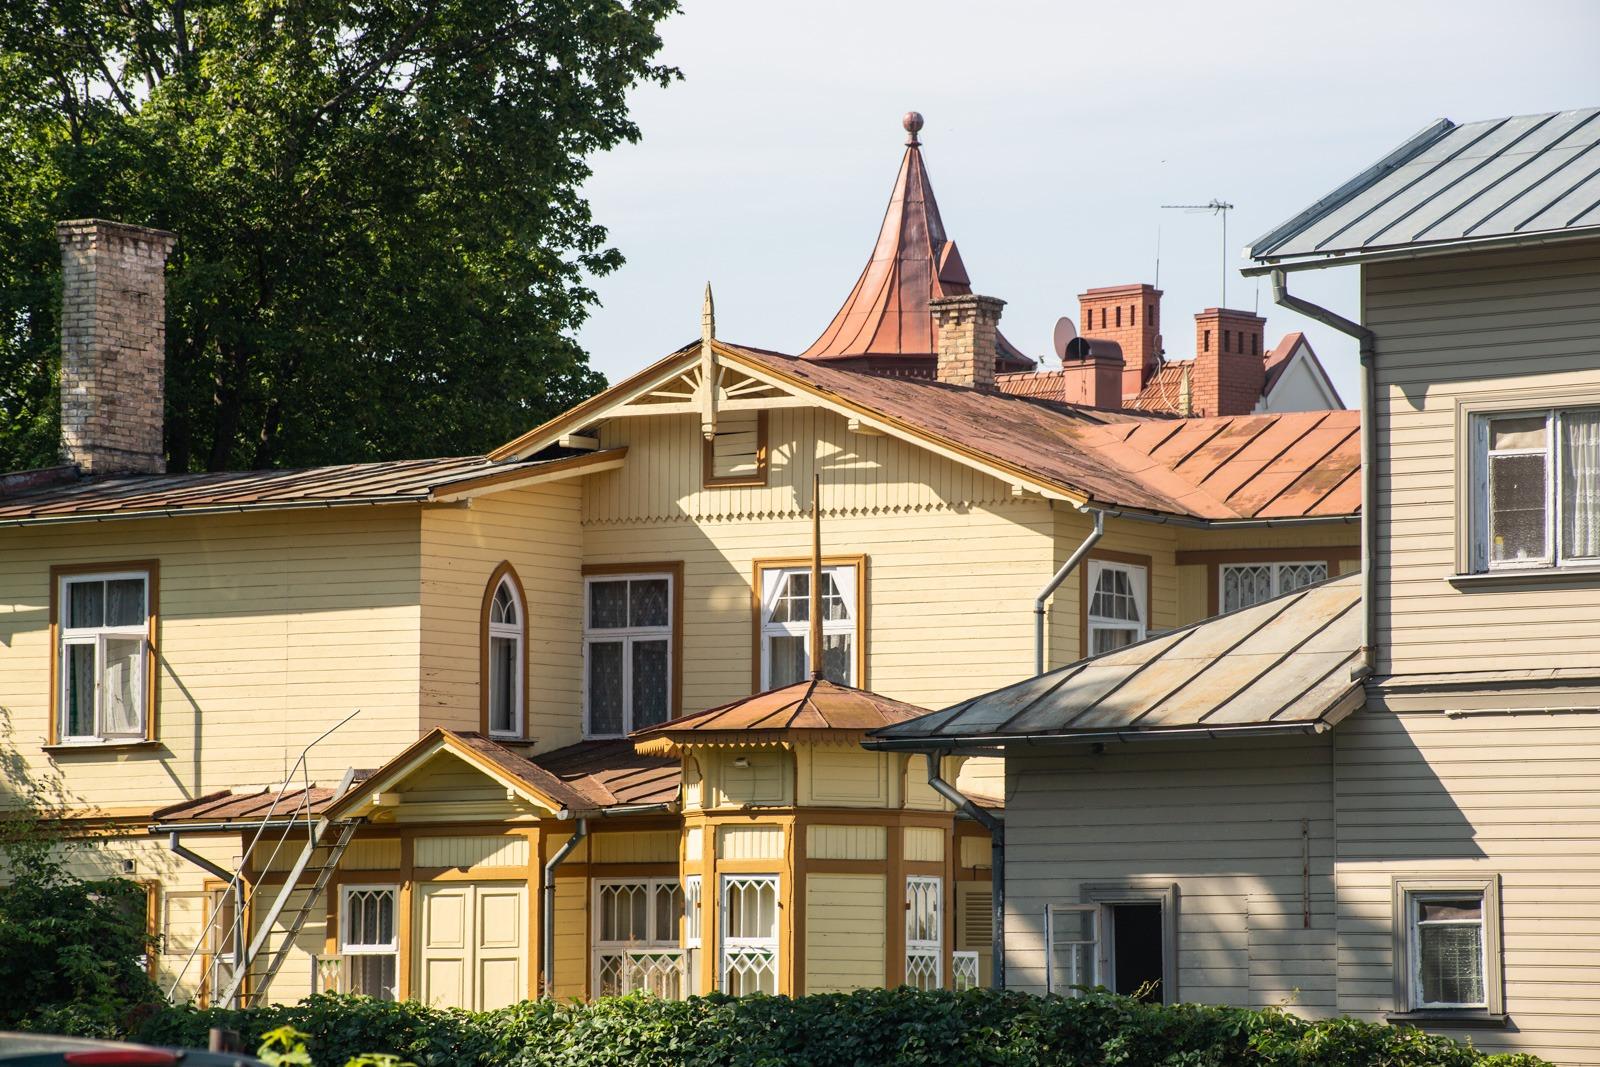 Tolle Architektur in Majori, Jurmala